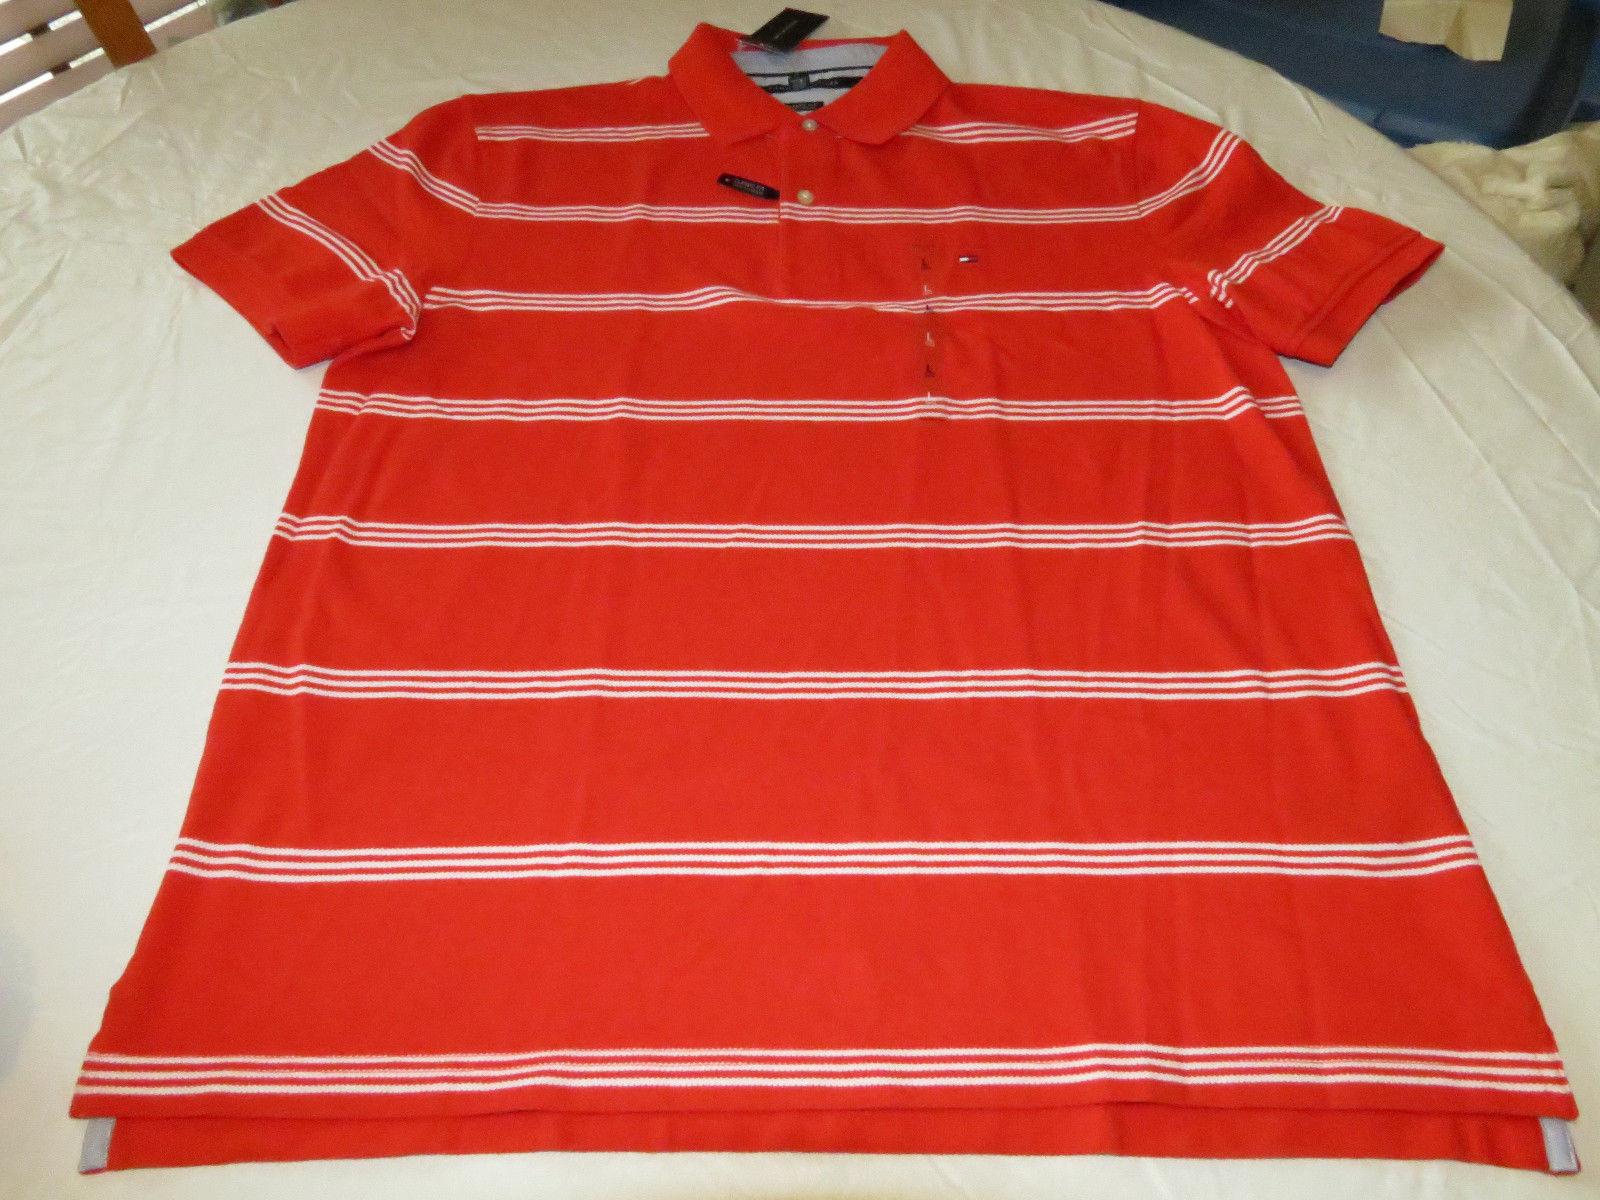 db35516e Men's Tommy Hilfiger Polo shirt logo 7871410 and 50 similar items. S l1600